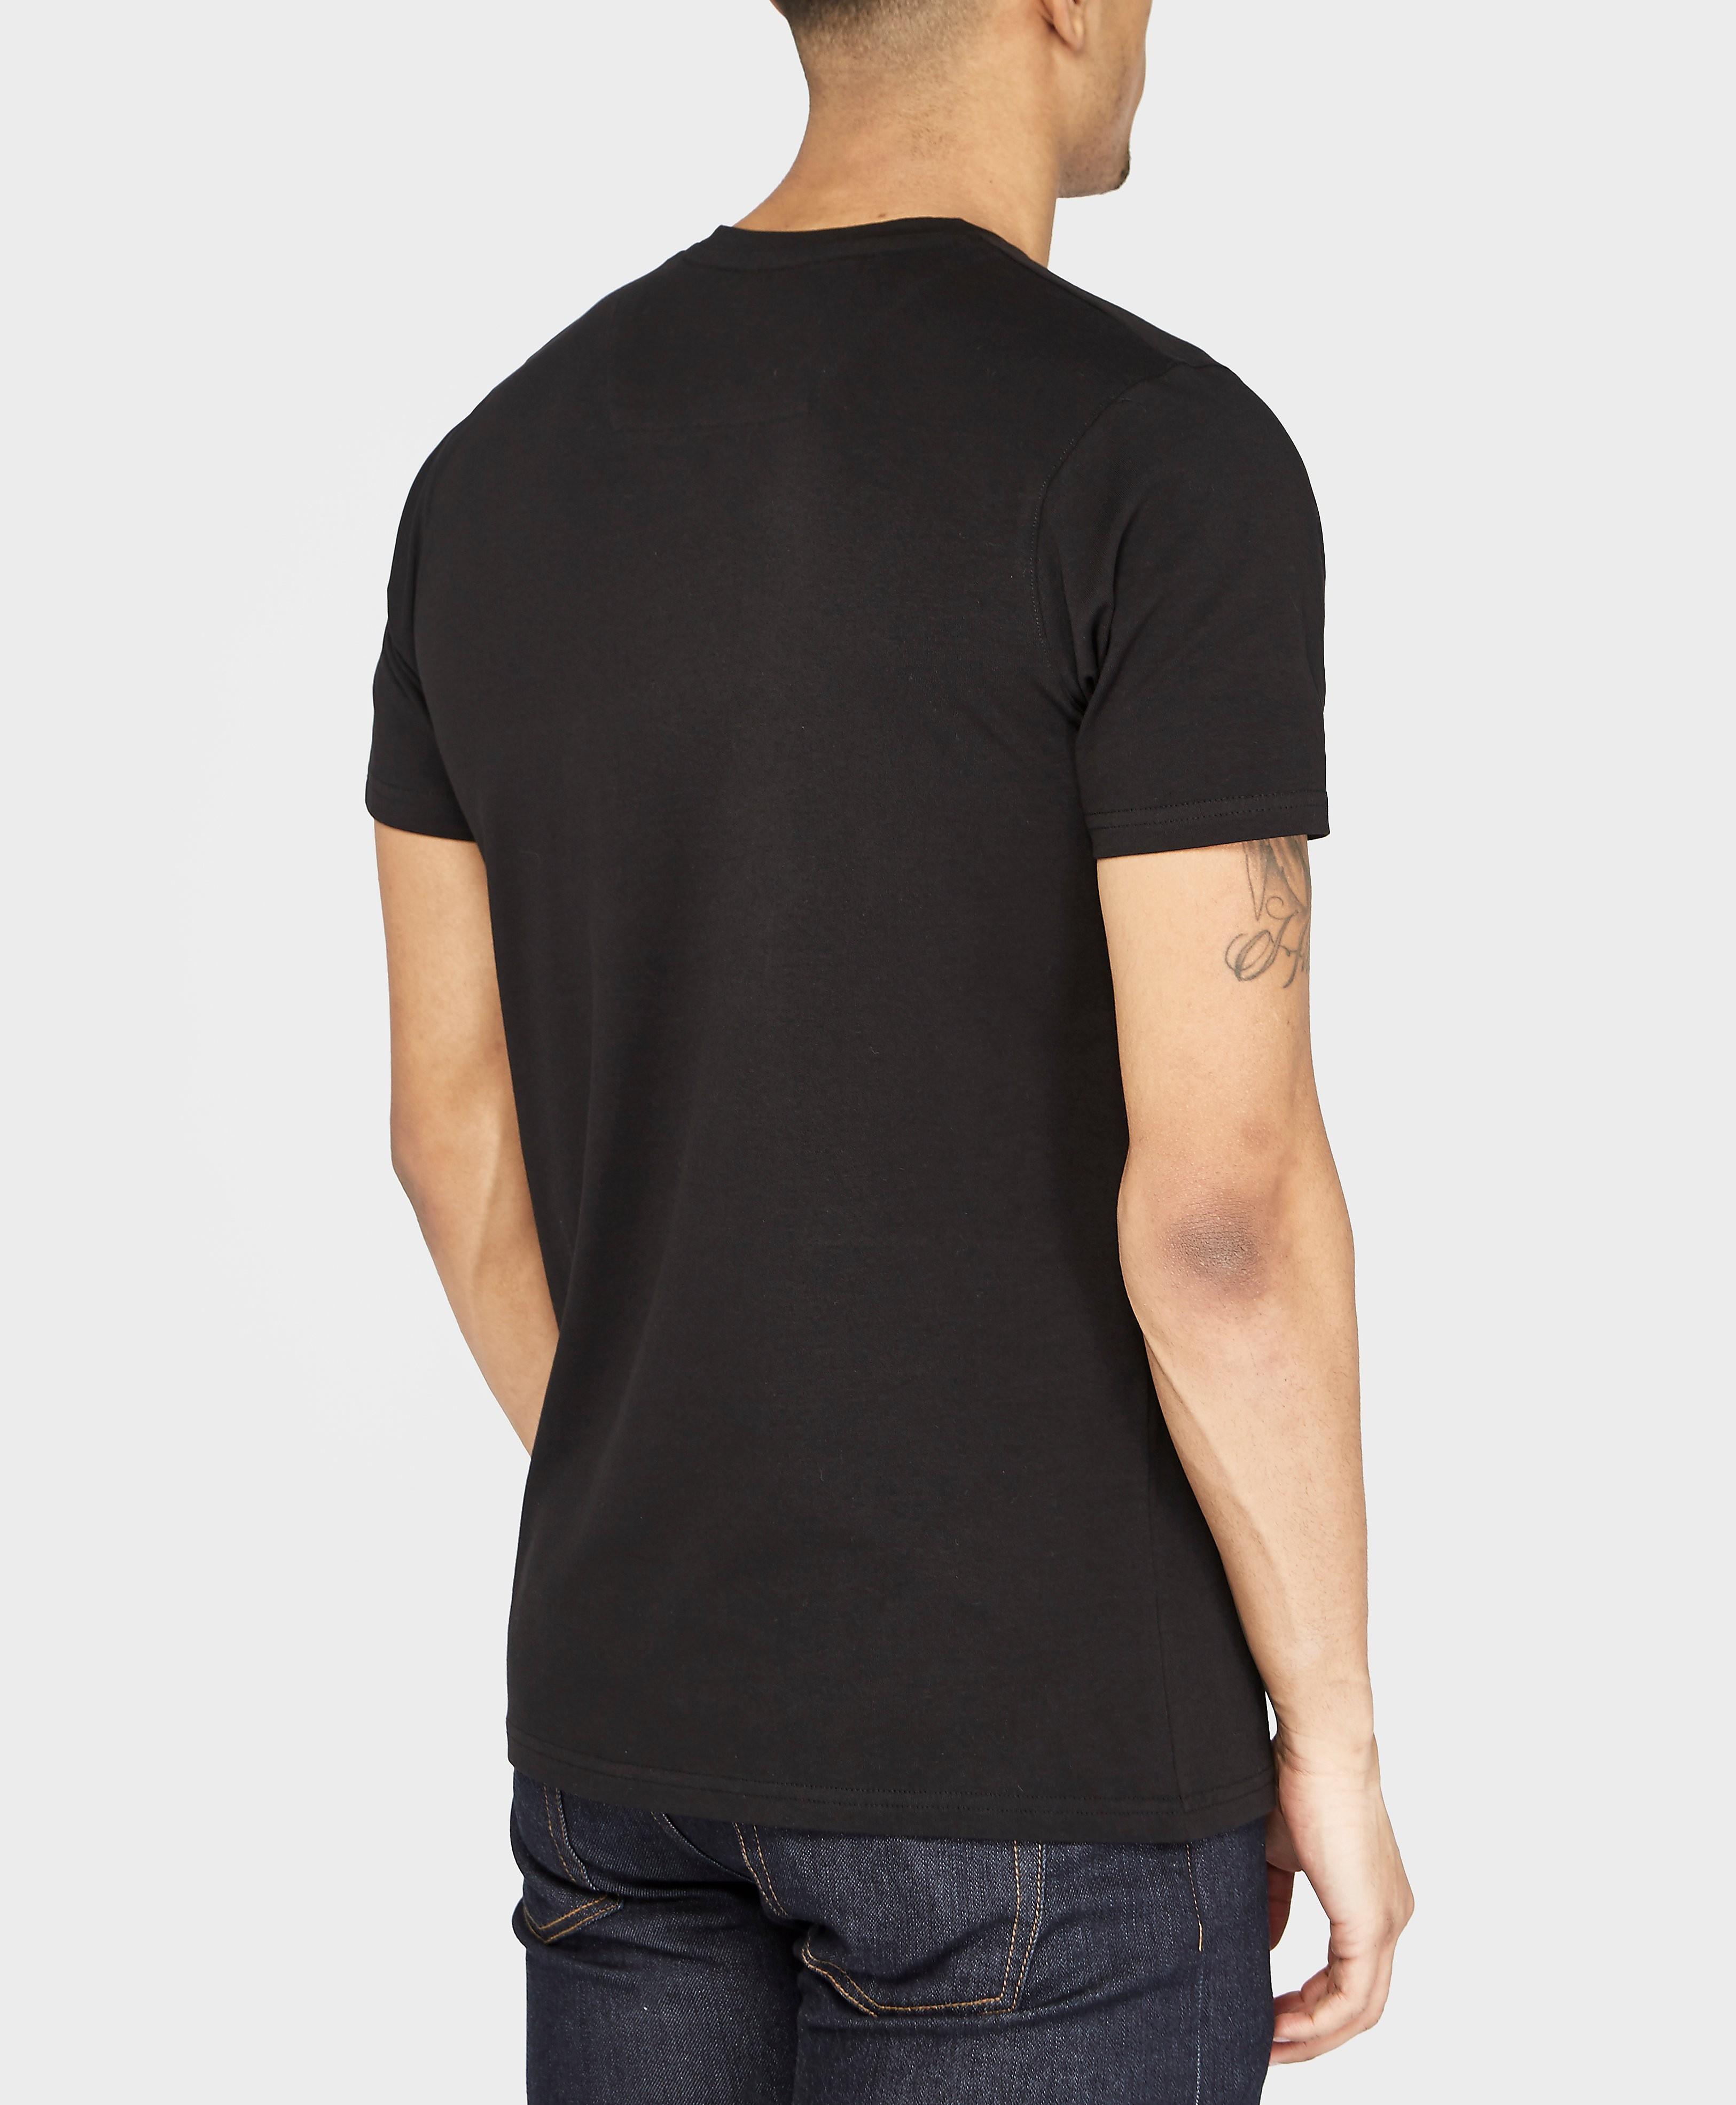 Cruyff Makay Logo Shirt